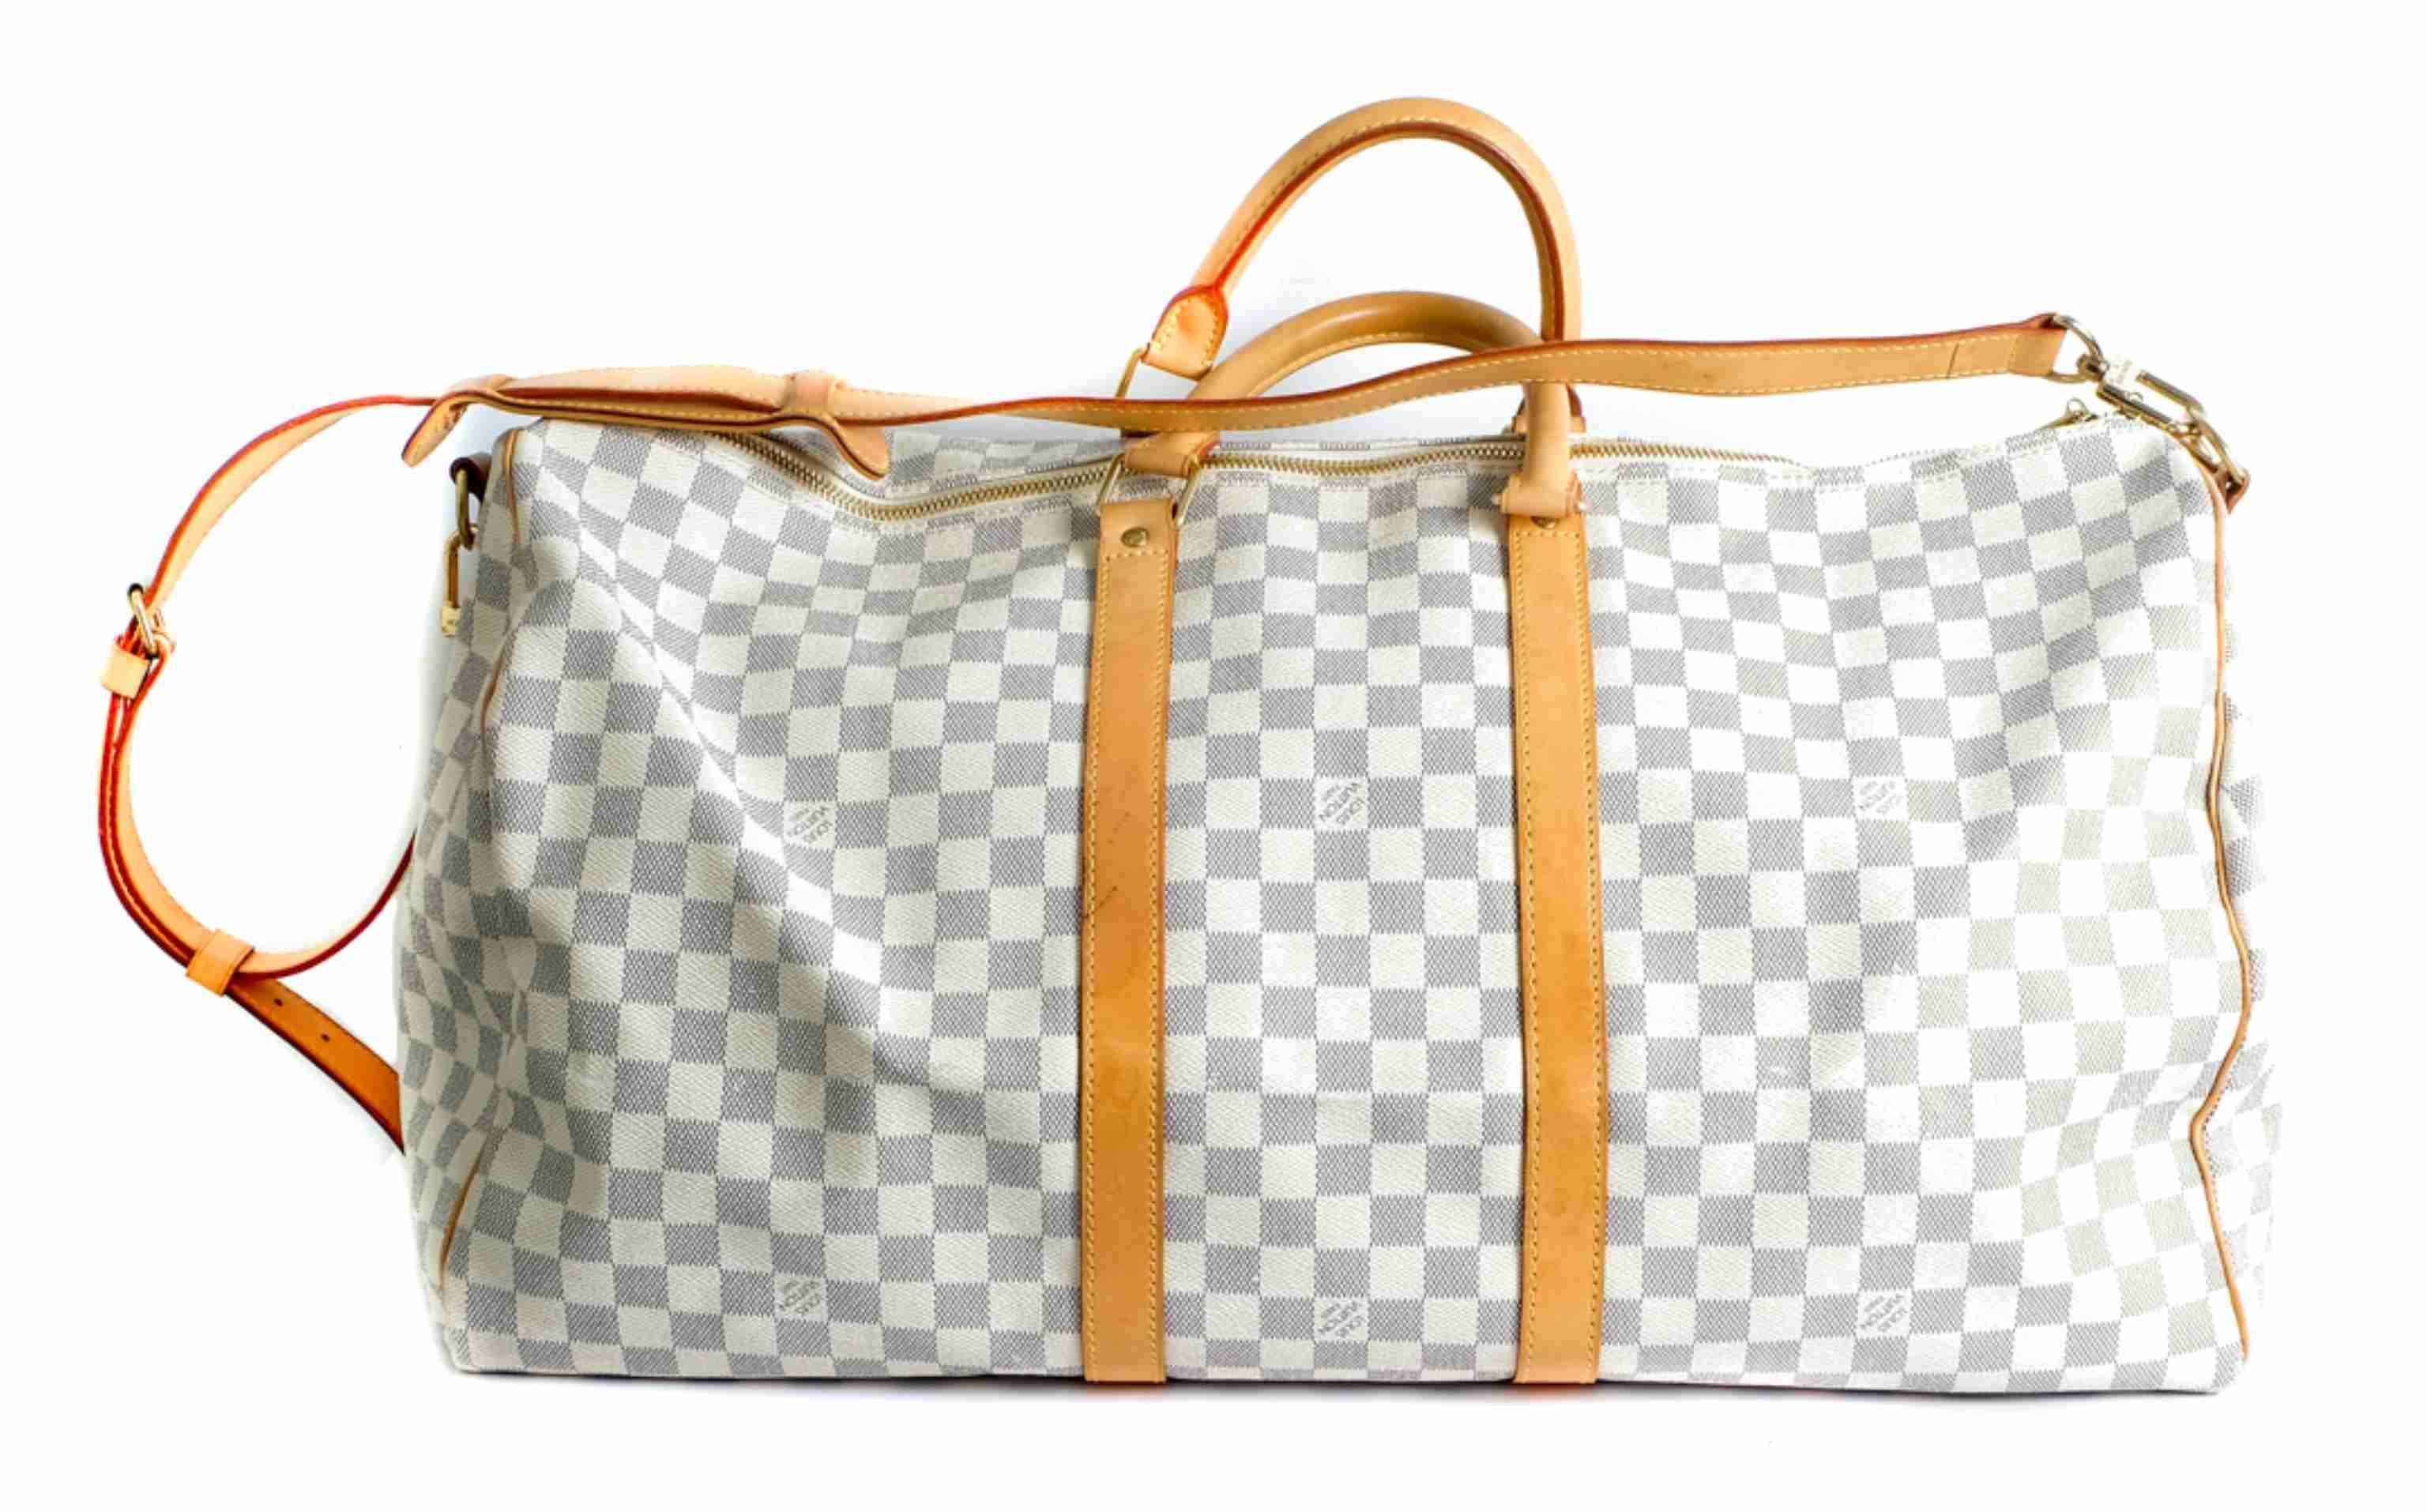 Louis Vuitton Damier Azur Keepall Bandouliere 55